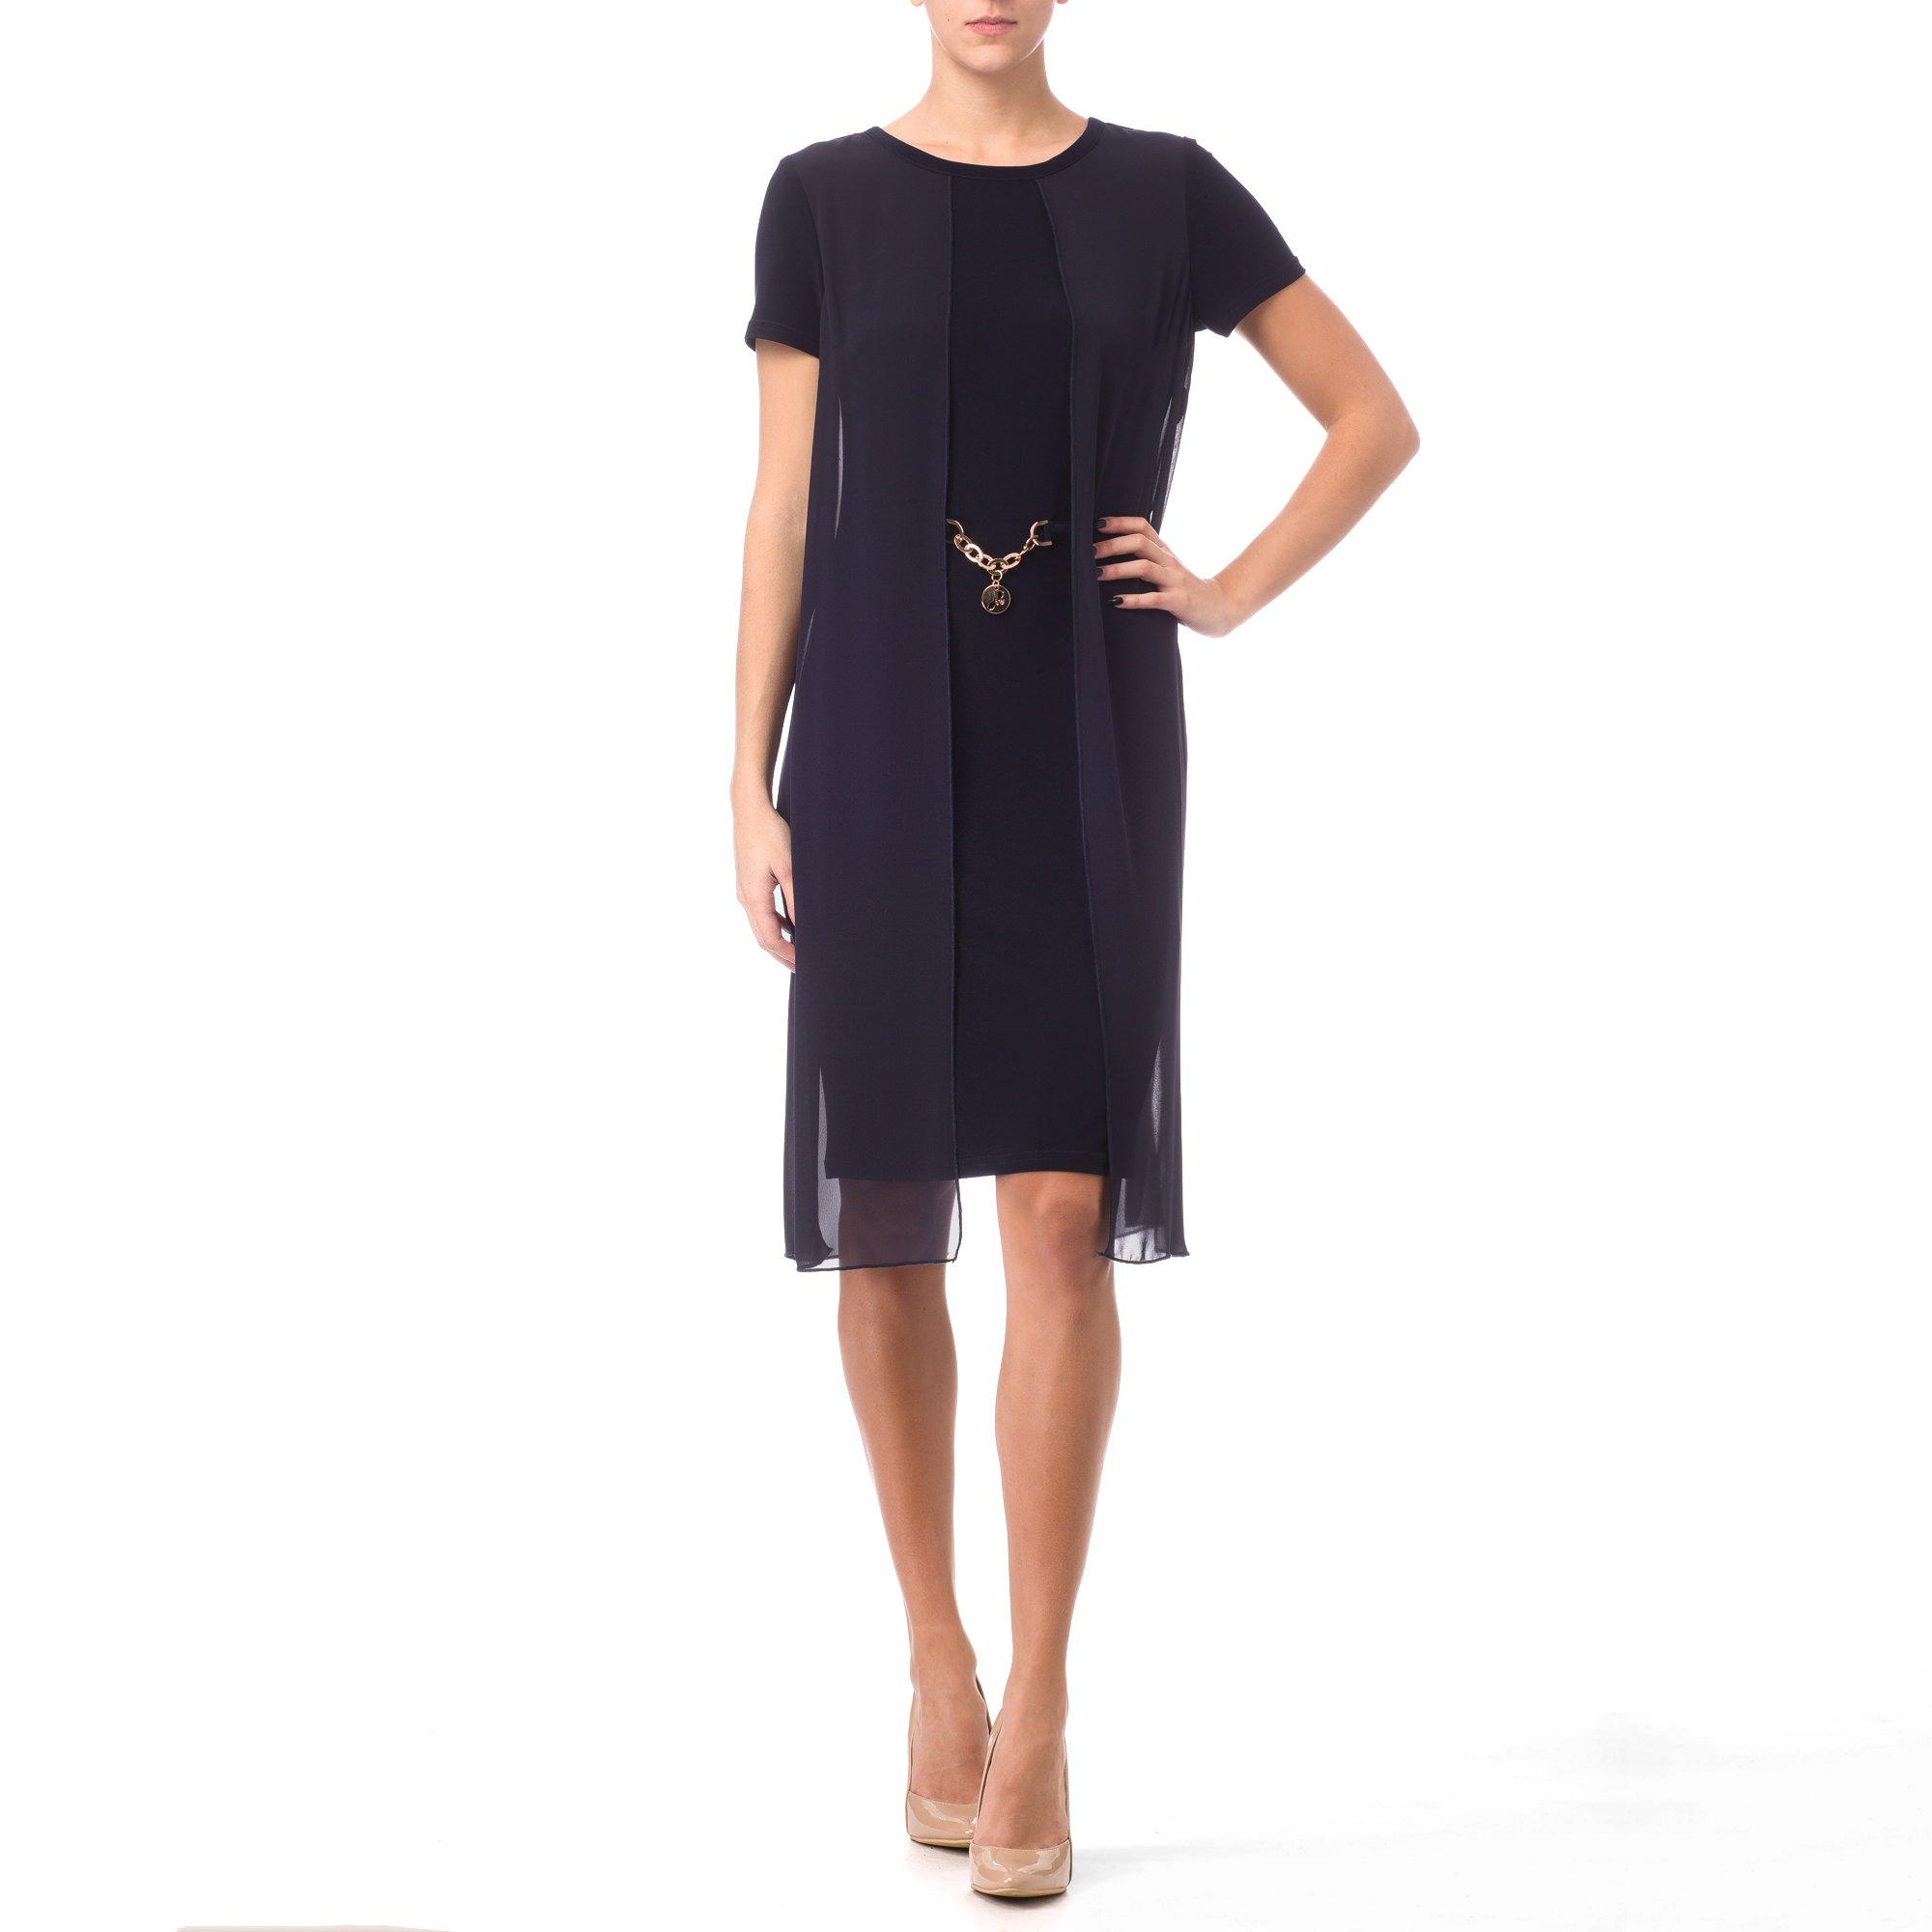 Joseph Ribkoff Dress Style 171263 Spring 2017 Collection (12, Midnight Blue)